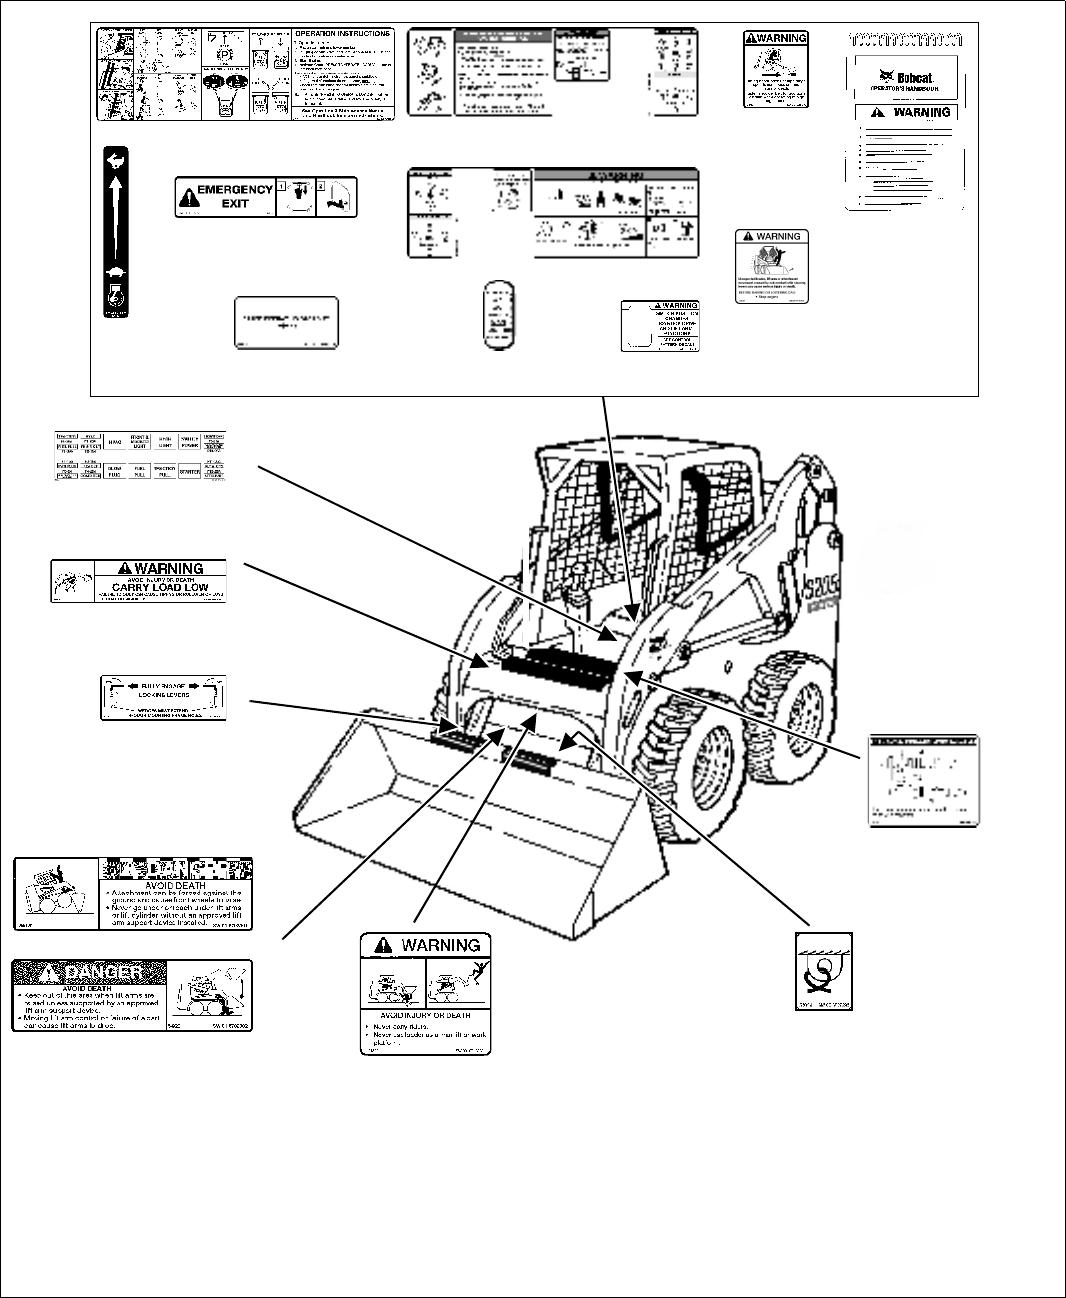 bobcat 863 fuse diagram - wiring diagram pipe-corsa-a -  pipe-corsa-a.pasticceriagele.it  pasticceriagele.it